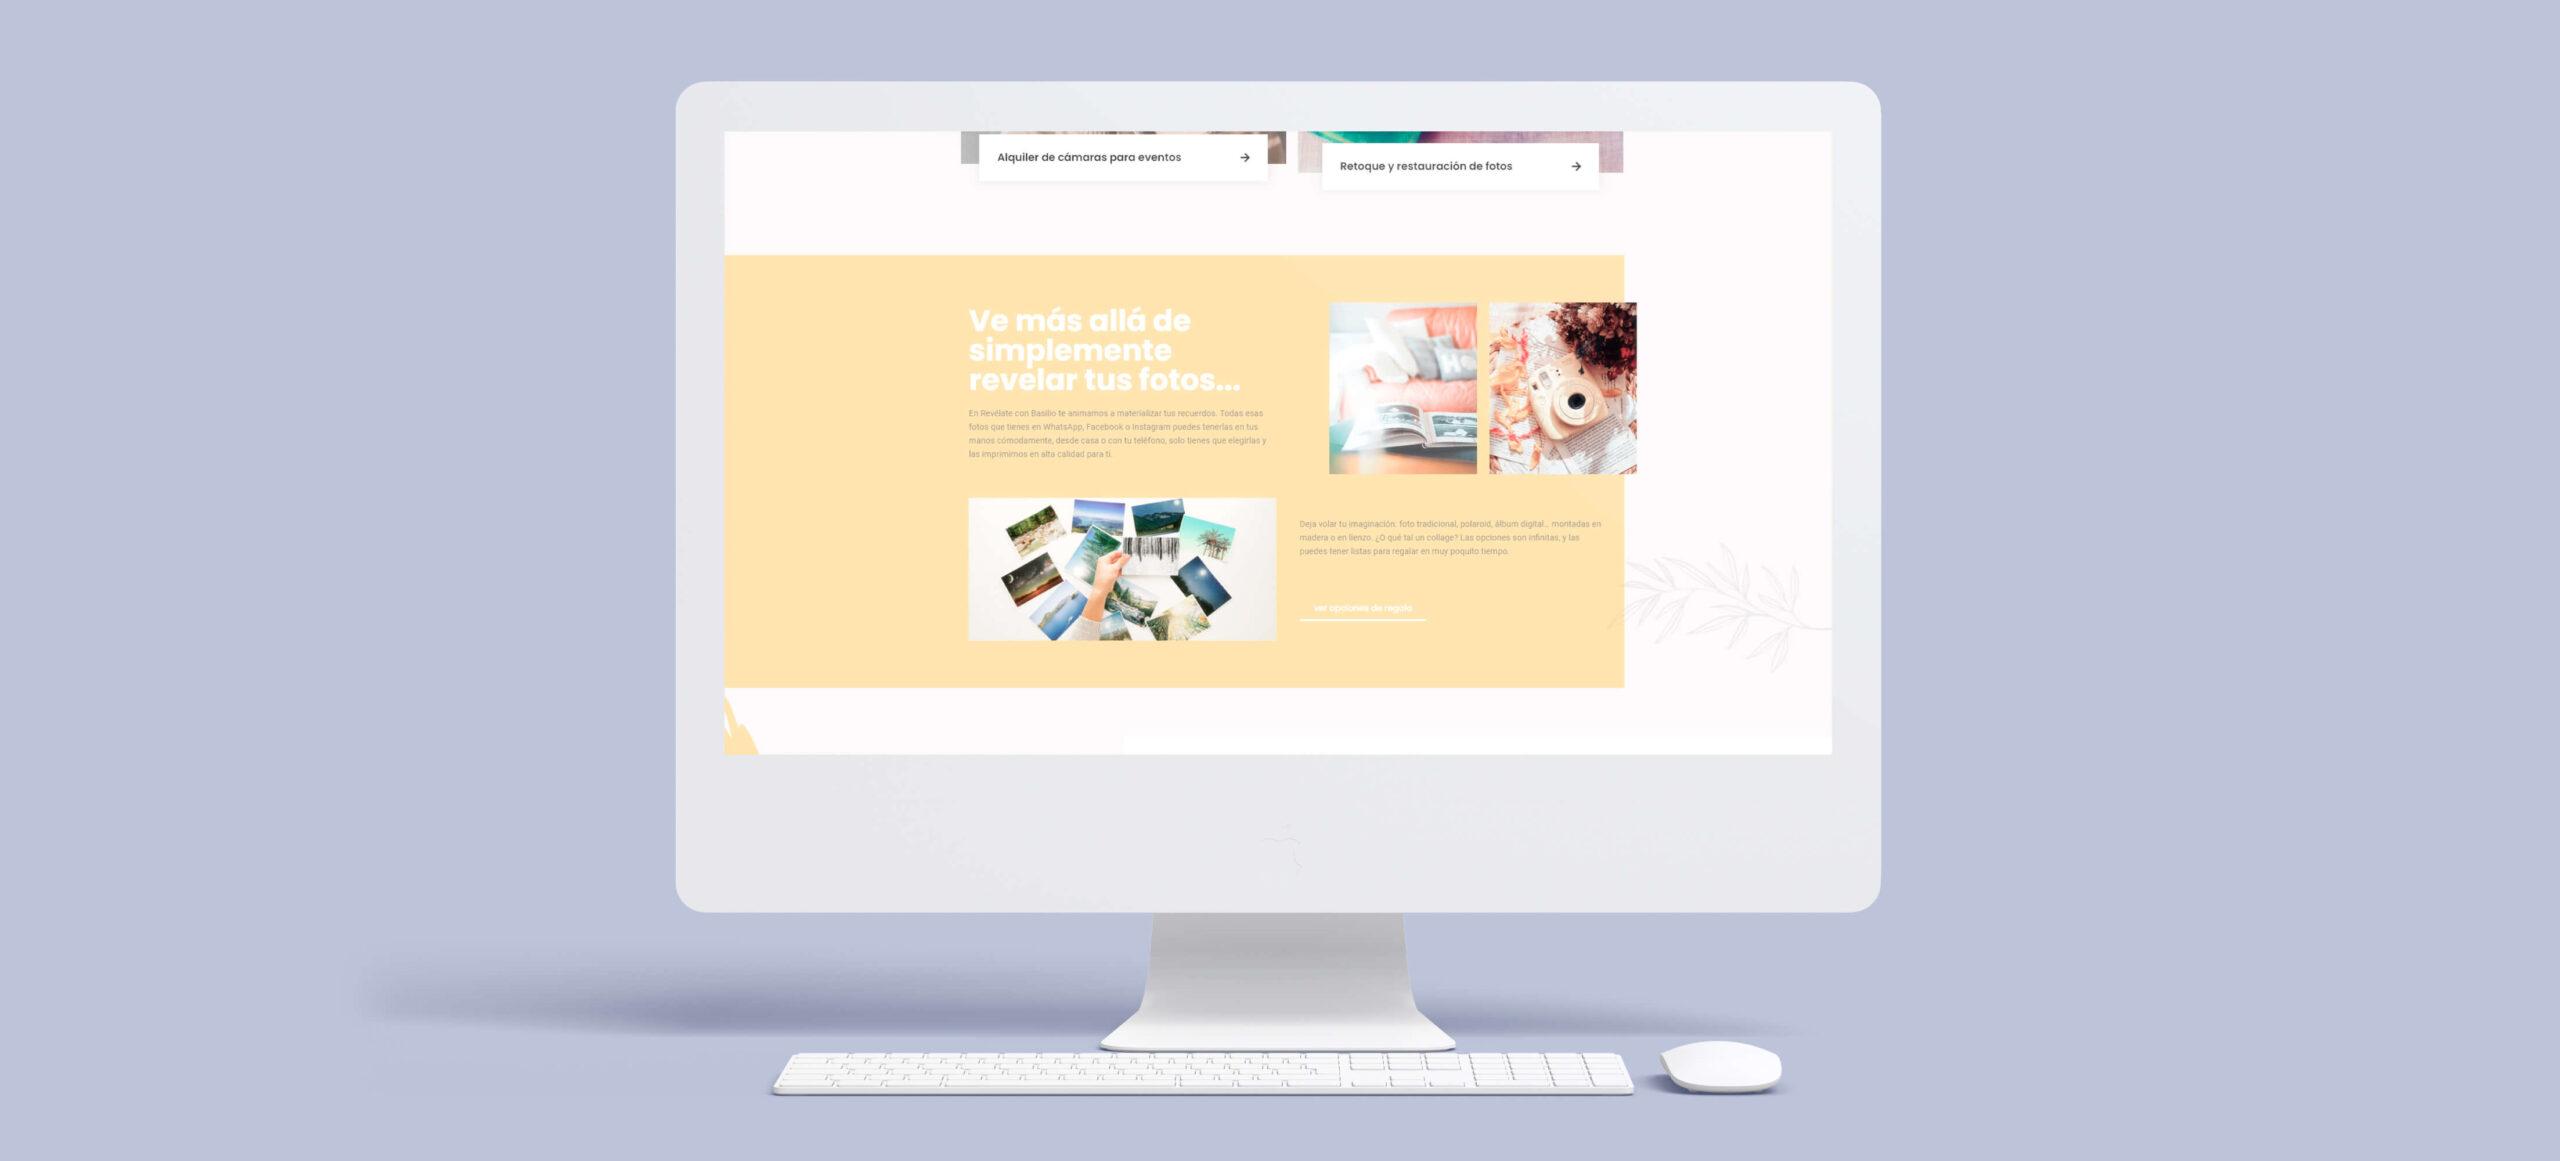 Errores de diseño web que debes evitar